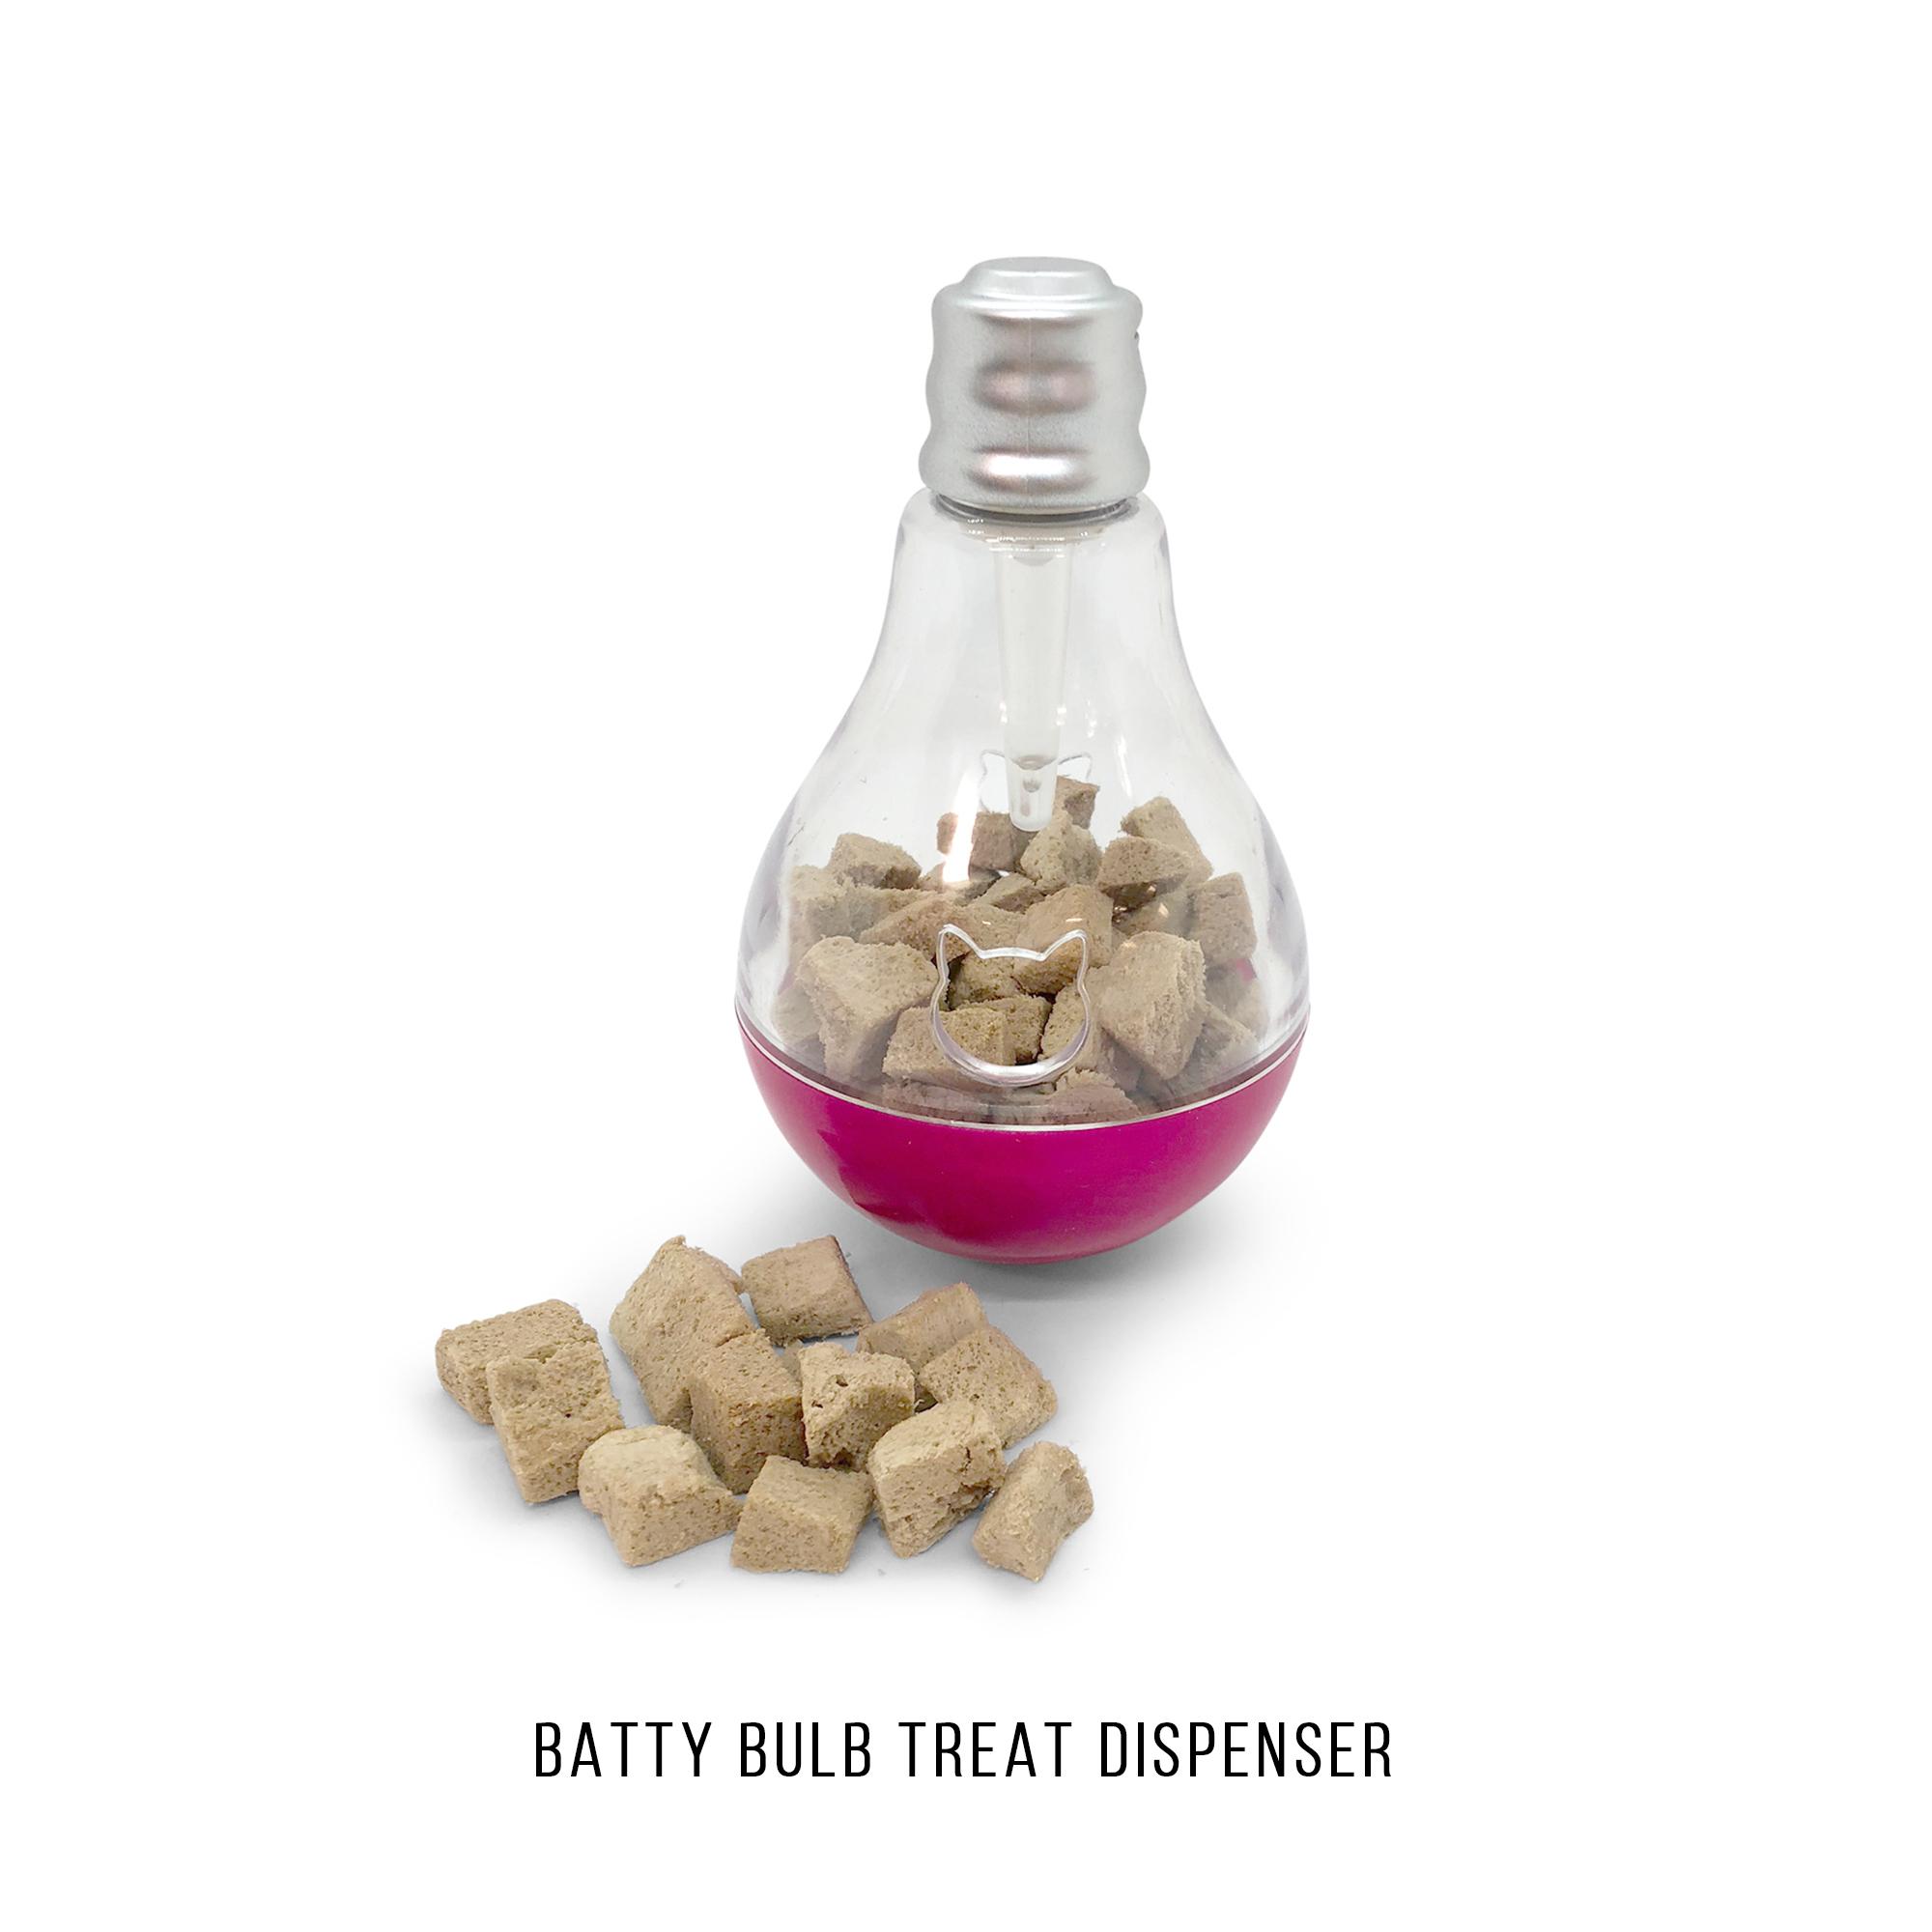 Pet Craft Supply Batty Bulb Treat Dispenser Slow Feeder Interactive Pet IQ Training